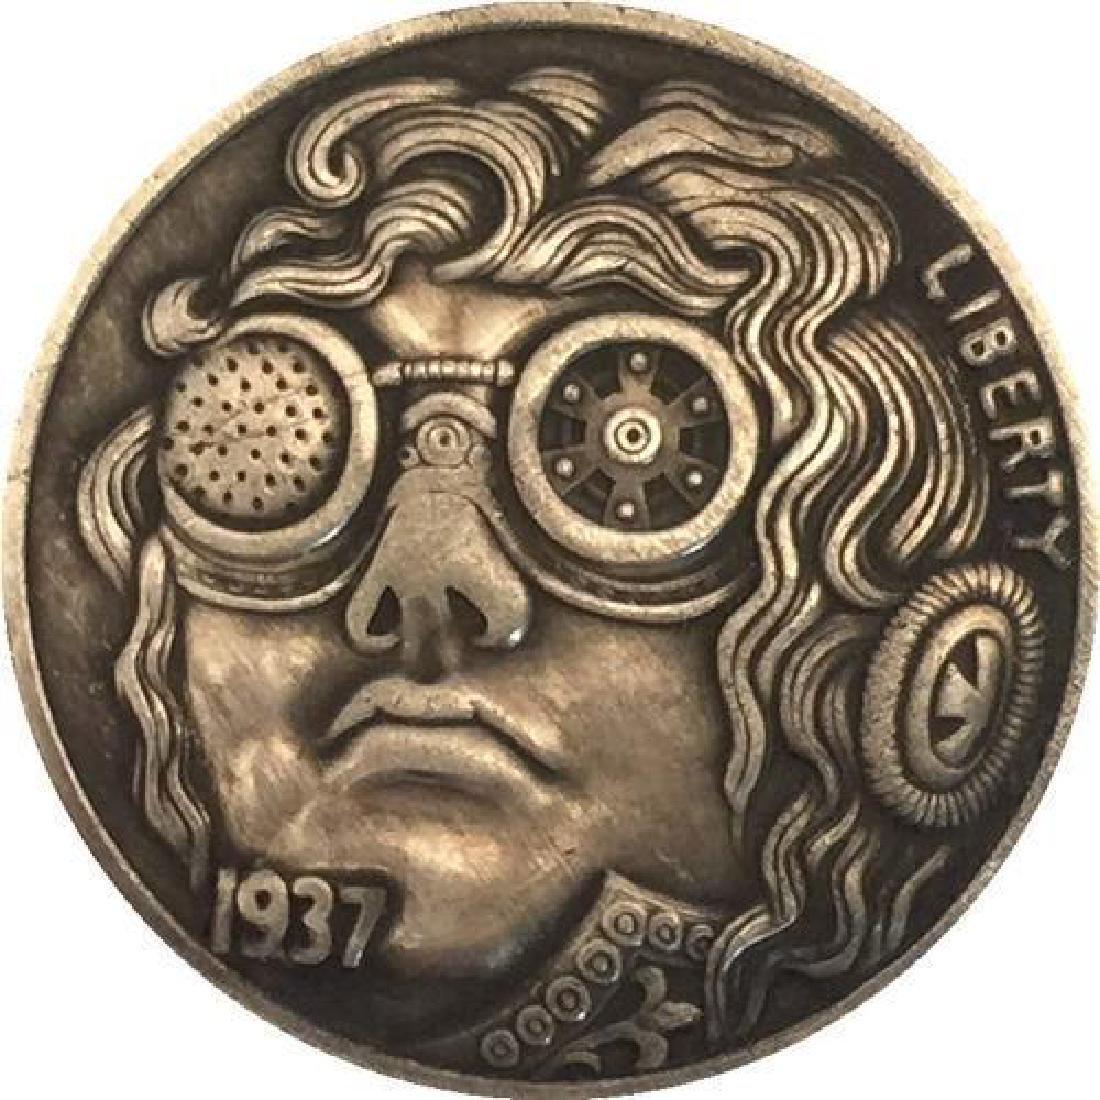 1937 USA The Futurist Buffalo Coin